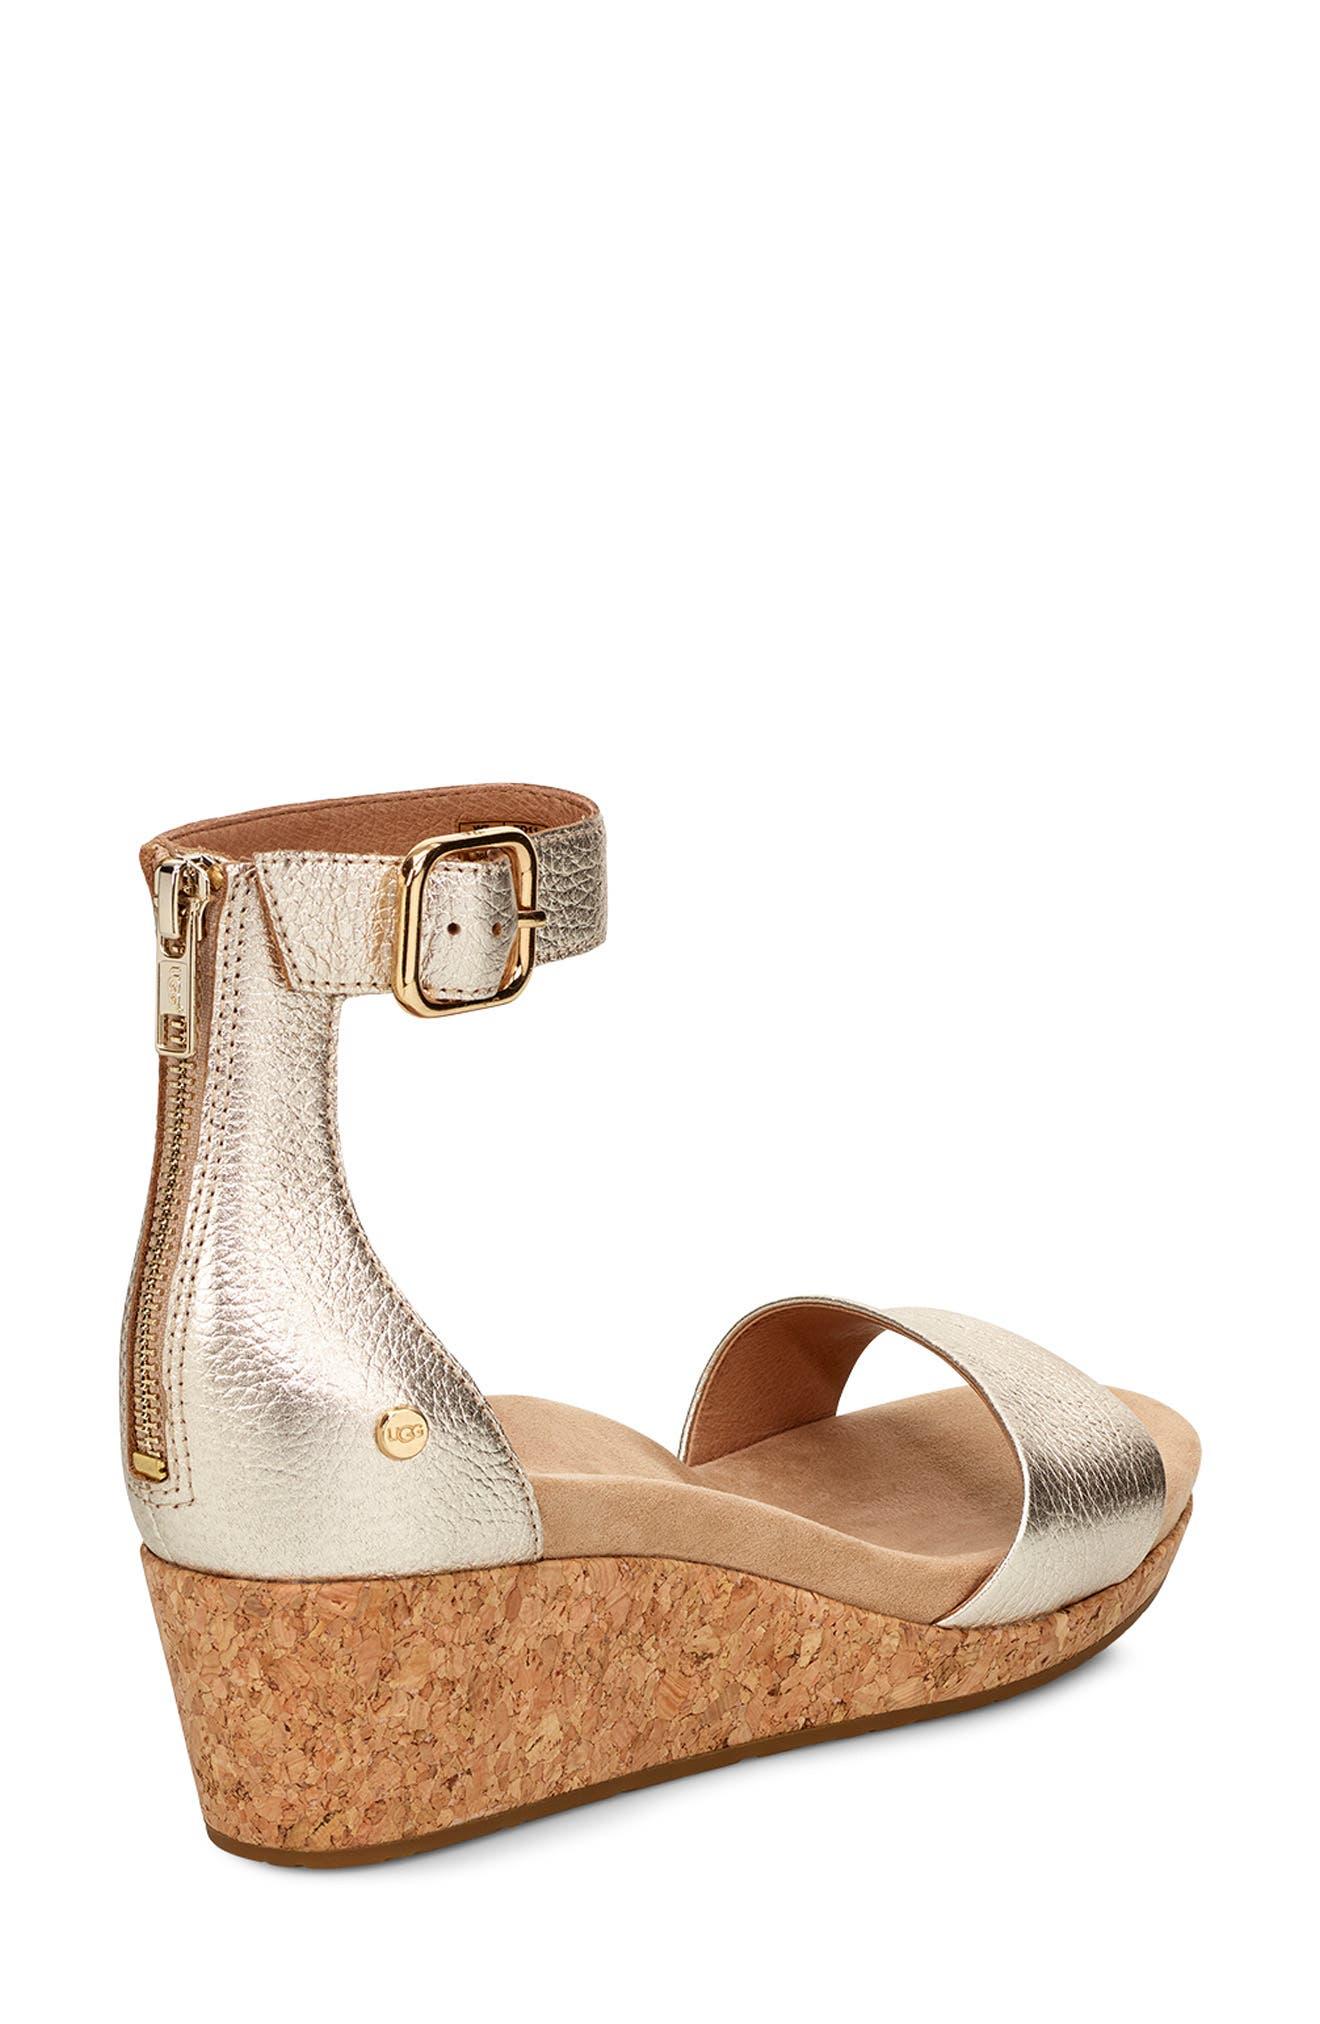 UGG<SUP>®</SUP>, Zoe II Metallic Wedge Sandal, Alternate thumbnail 2, color, GOLD LEATHER